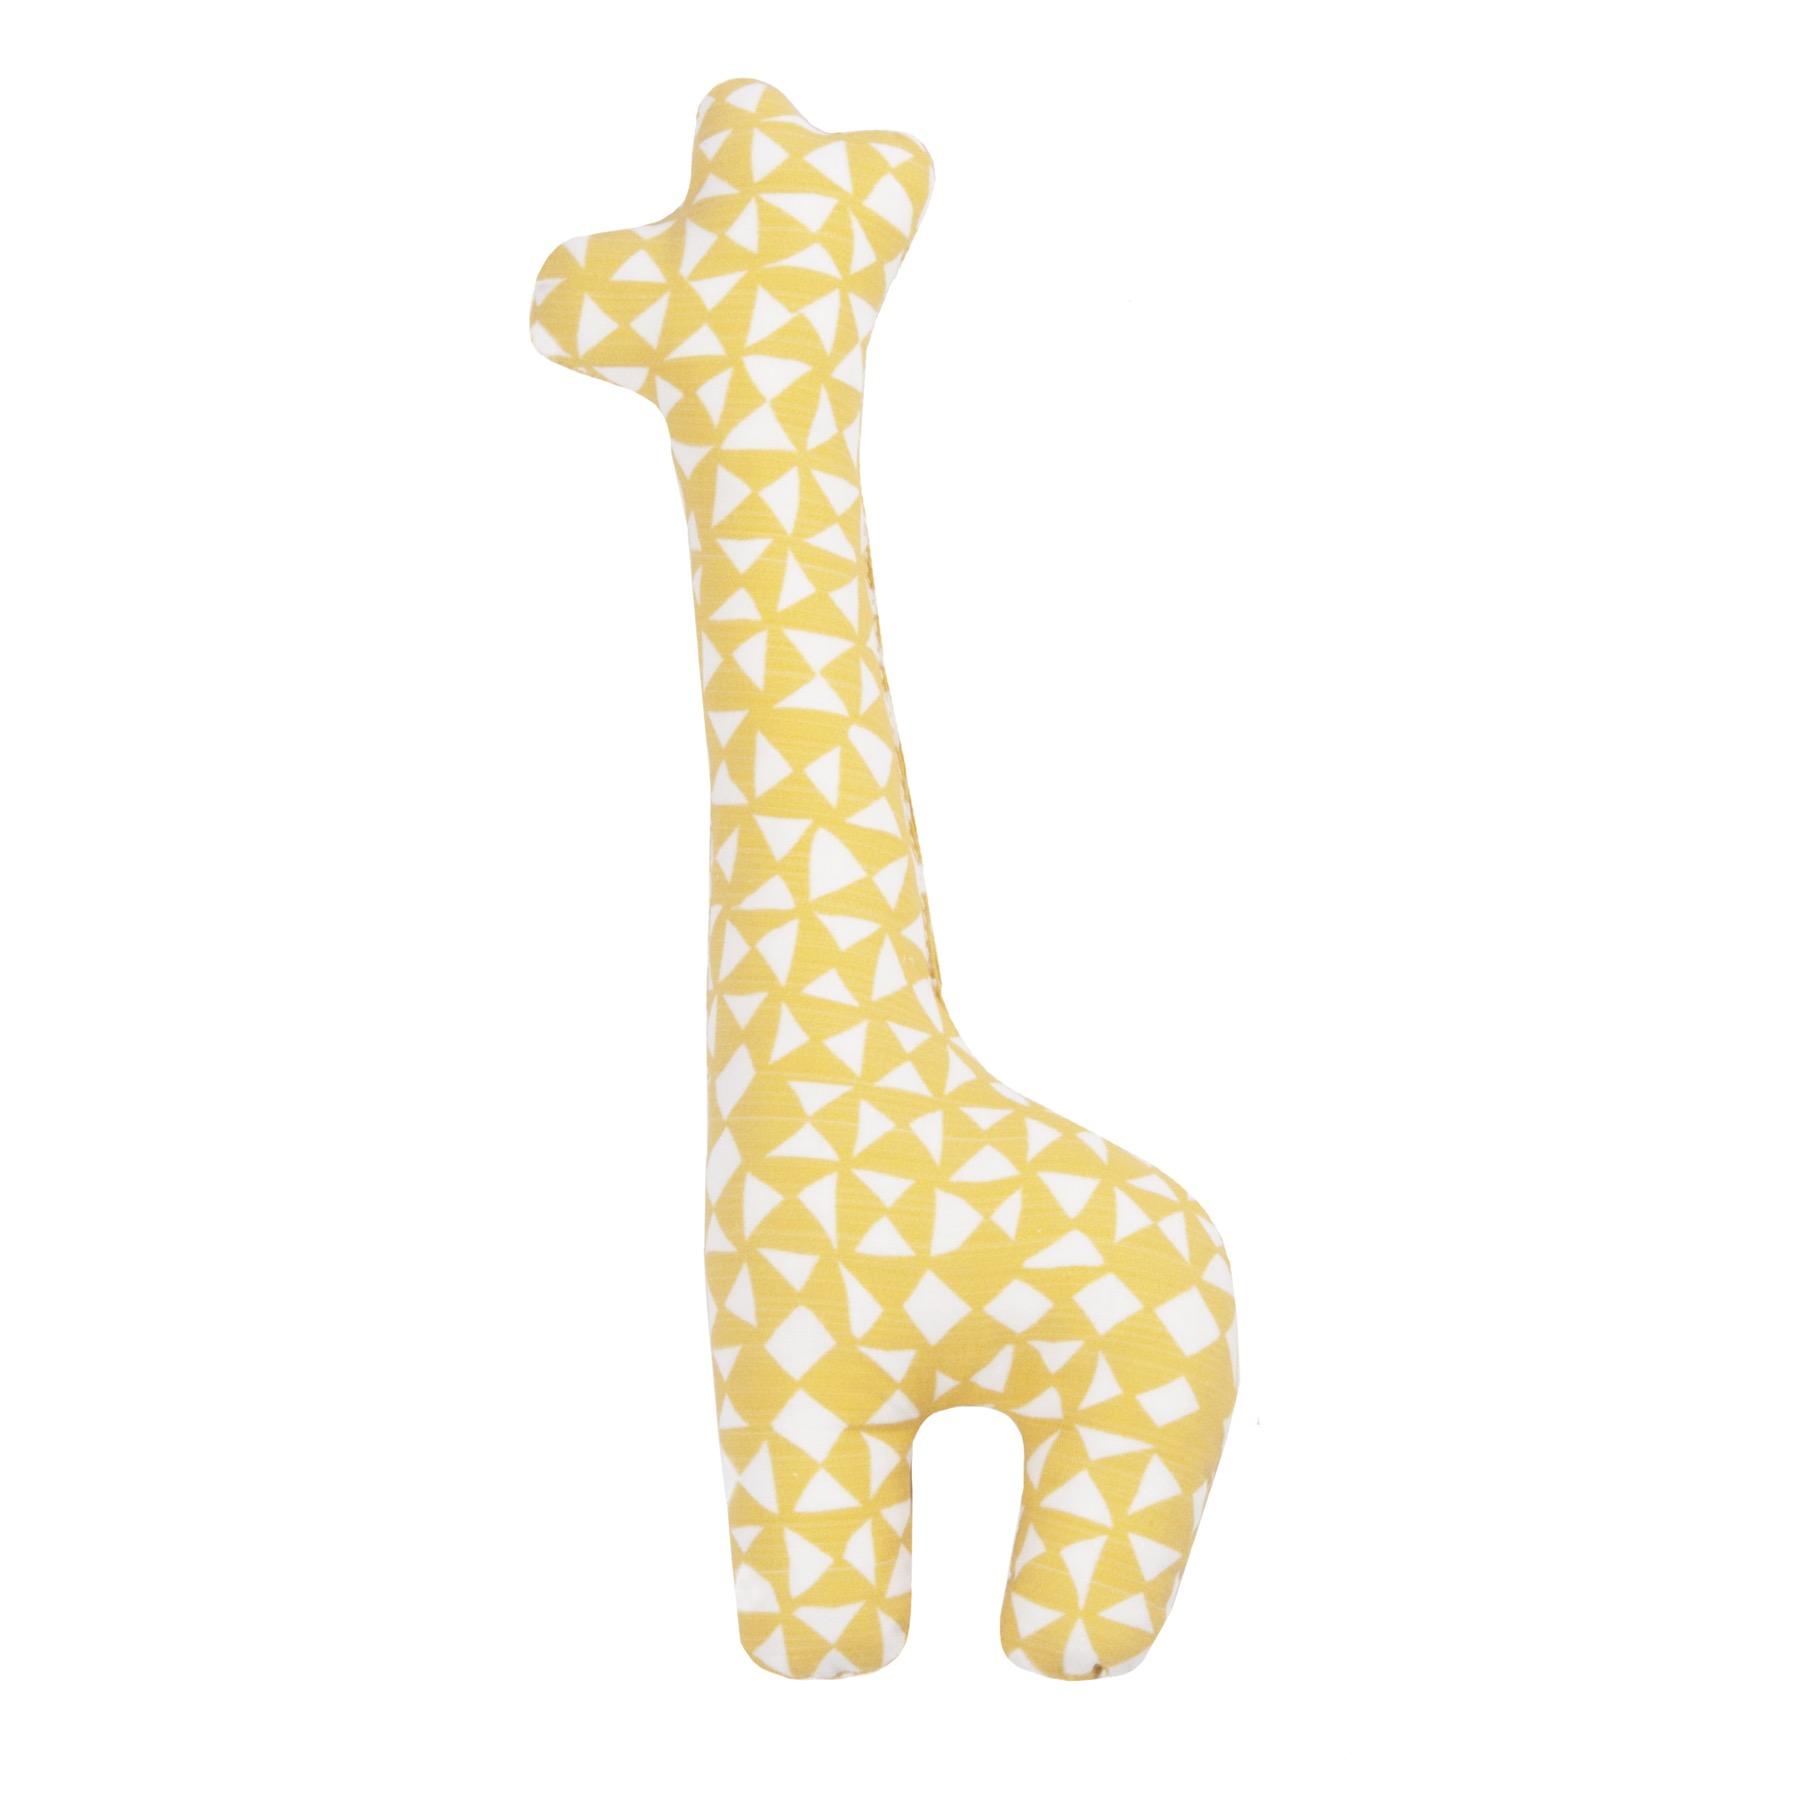 3b198f121fd Rattle Giraffe Diabolo – Okiddoky – Online concept store for cool ...